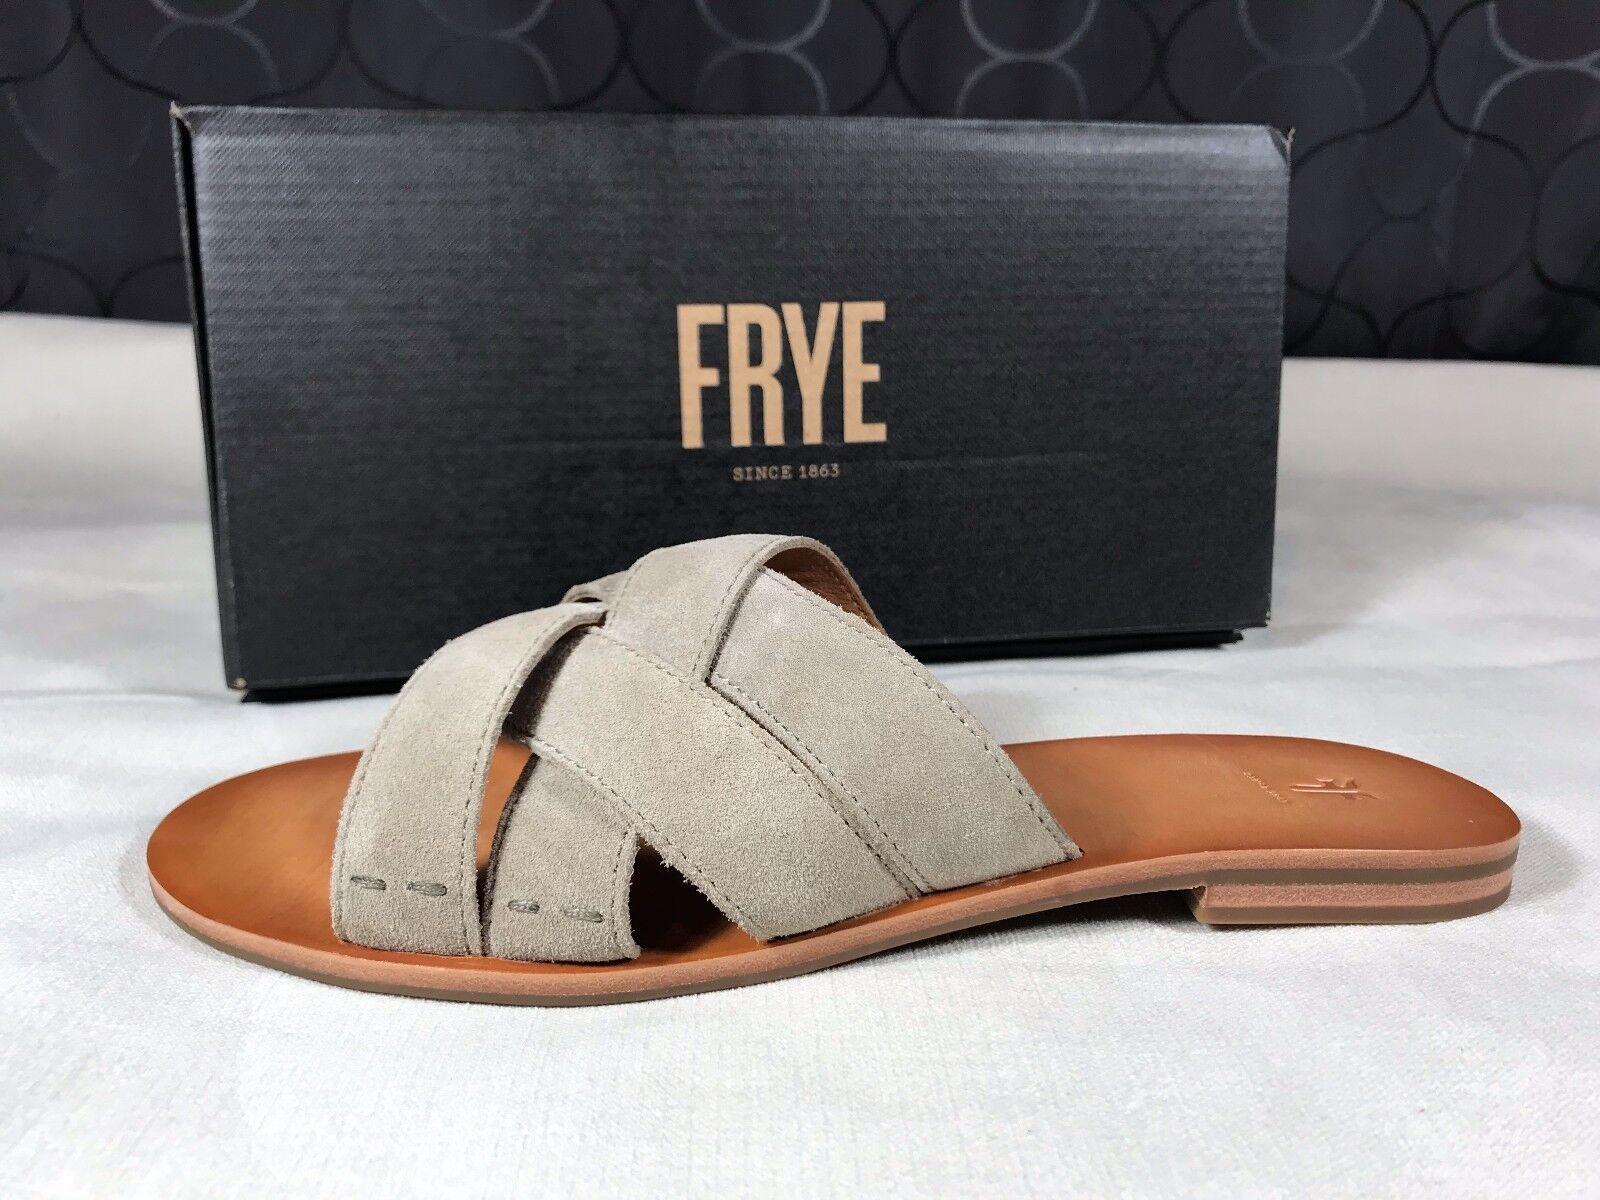 128 Frye Carla Criss Cross Ash Gray Suede Leder Slide Sandale Flip Flops